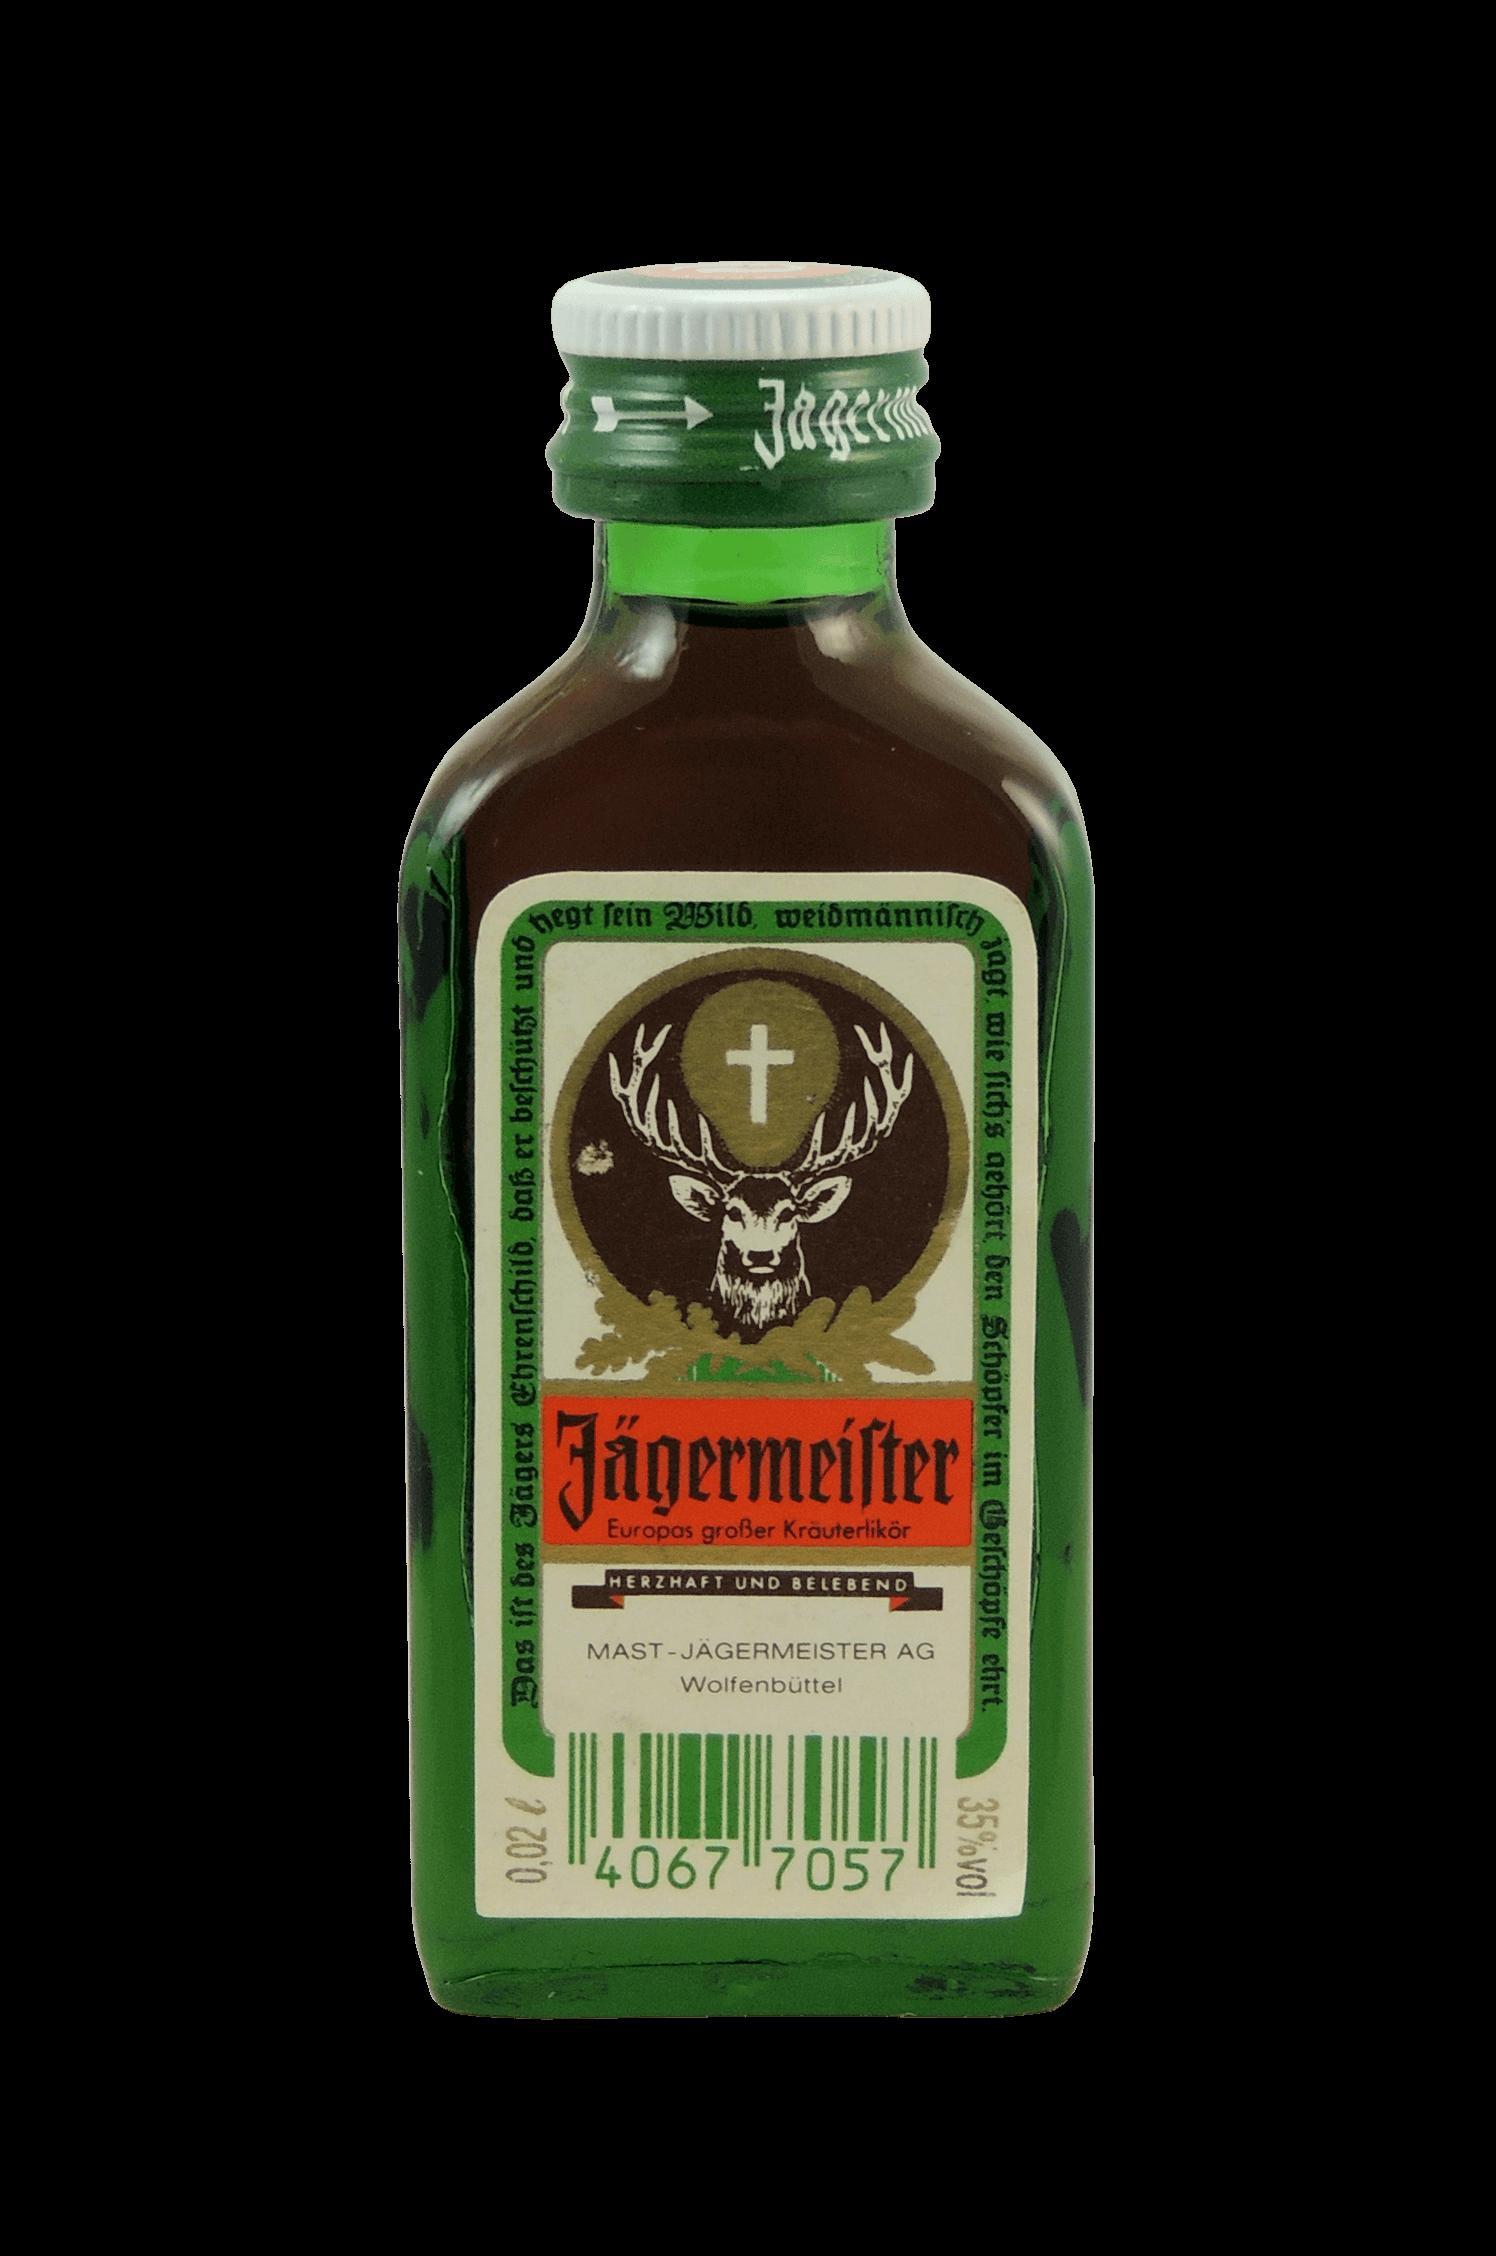 Jägermeifter